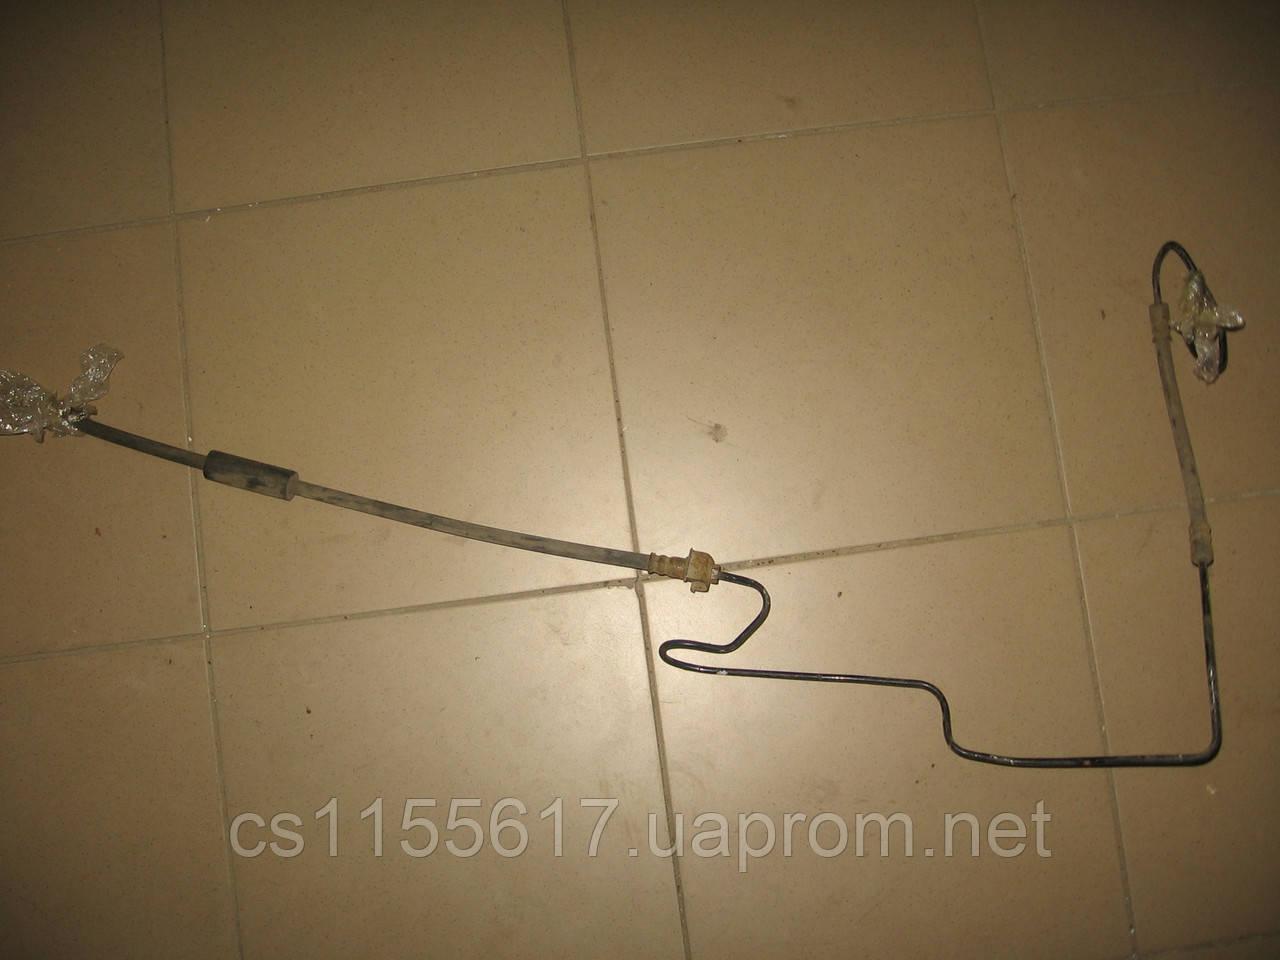 Трубка тормозная задняя правая б/у на Renault Master, Opel Movano, Nissan Interstar 1998-2010 год (балка)